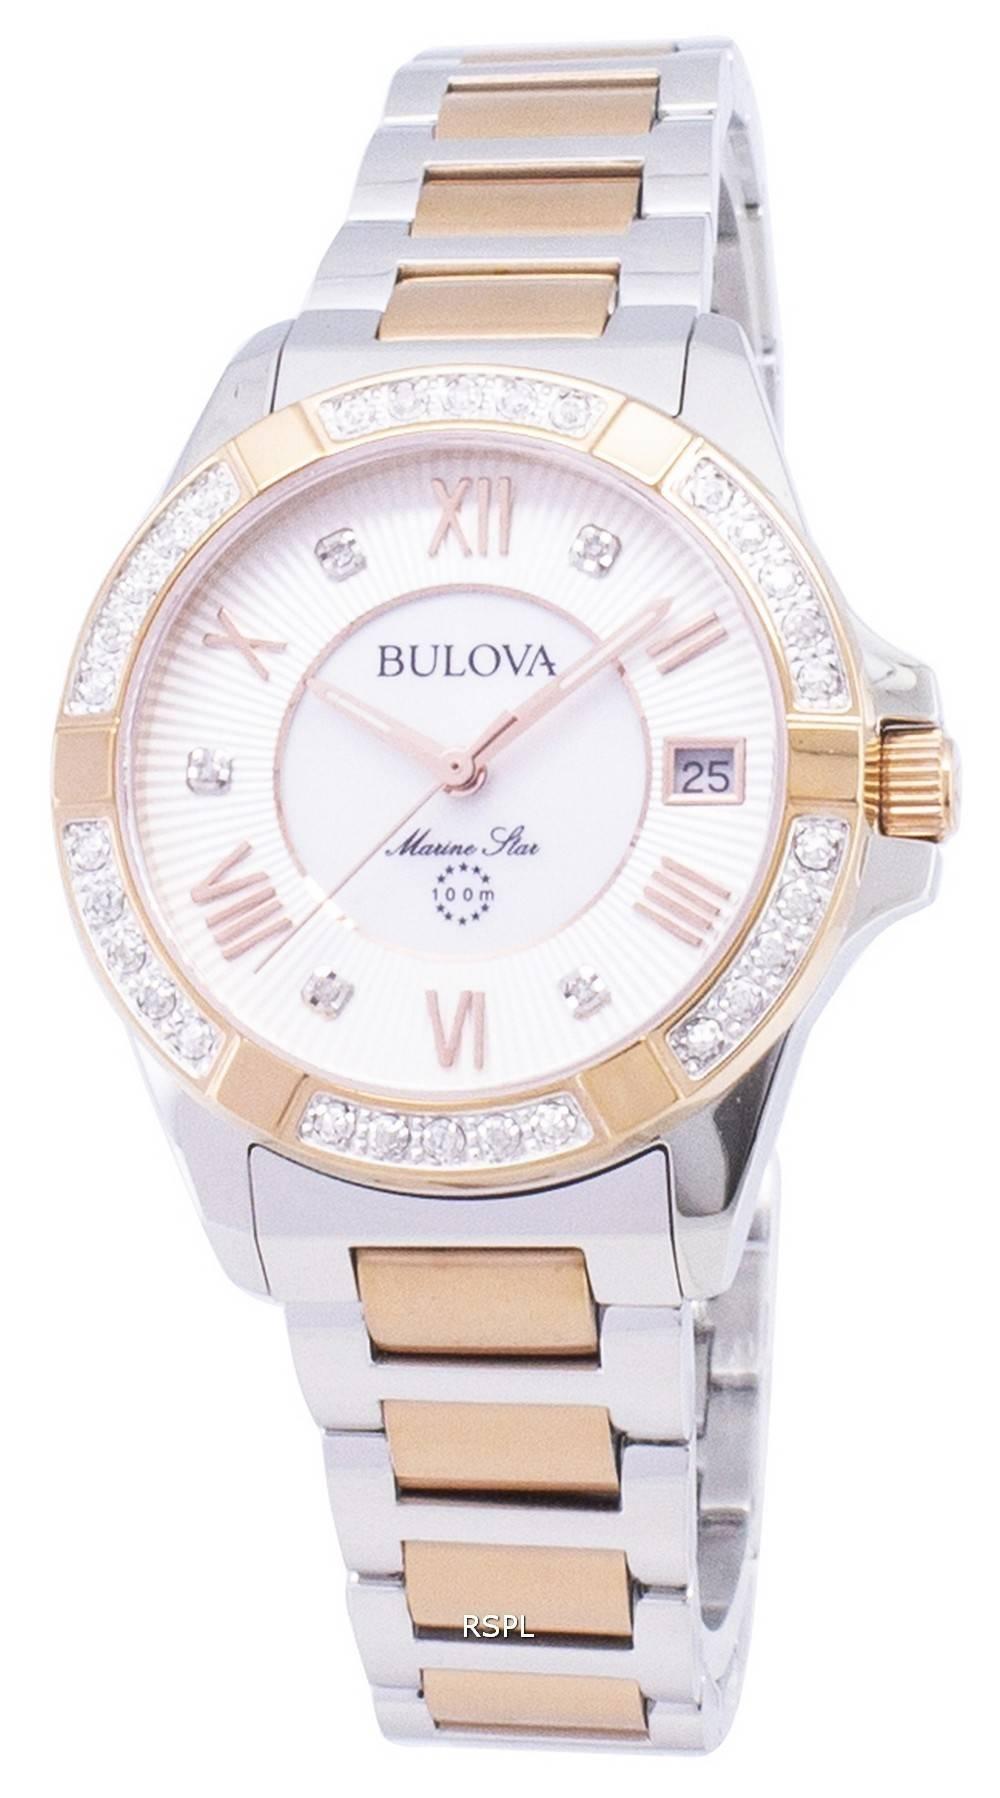 4605a7308 Bulova Marine Star 98R234 Diamond Accent Quartz Women's Watch Singapore